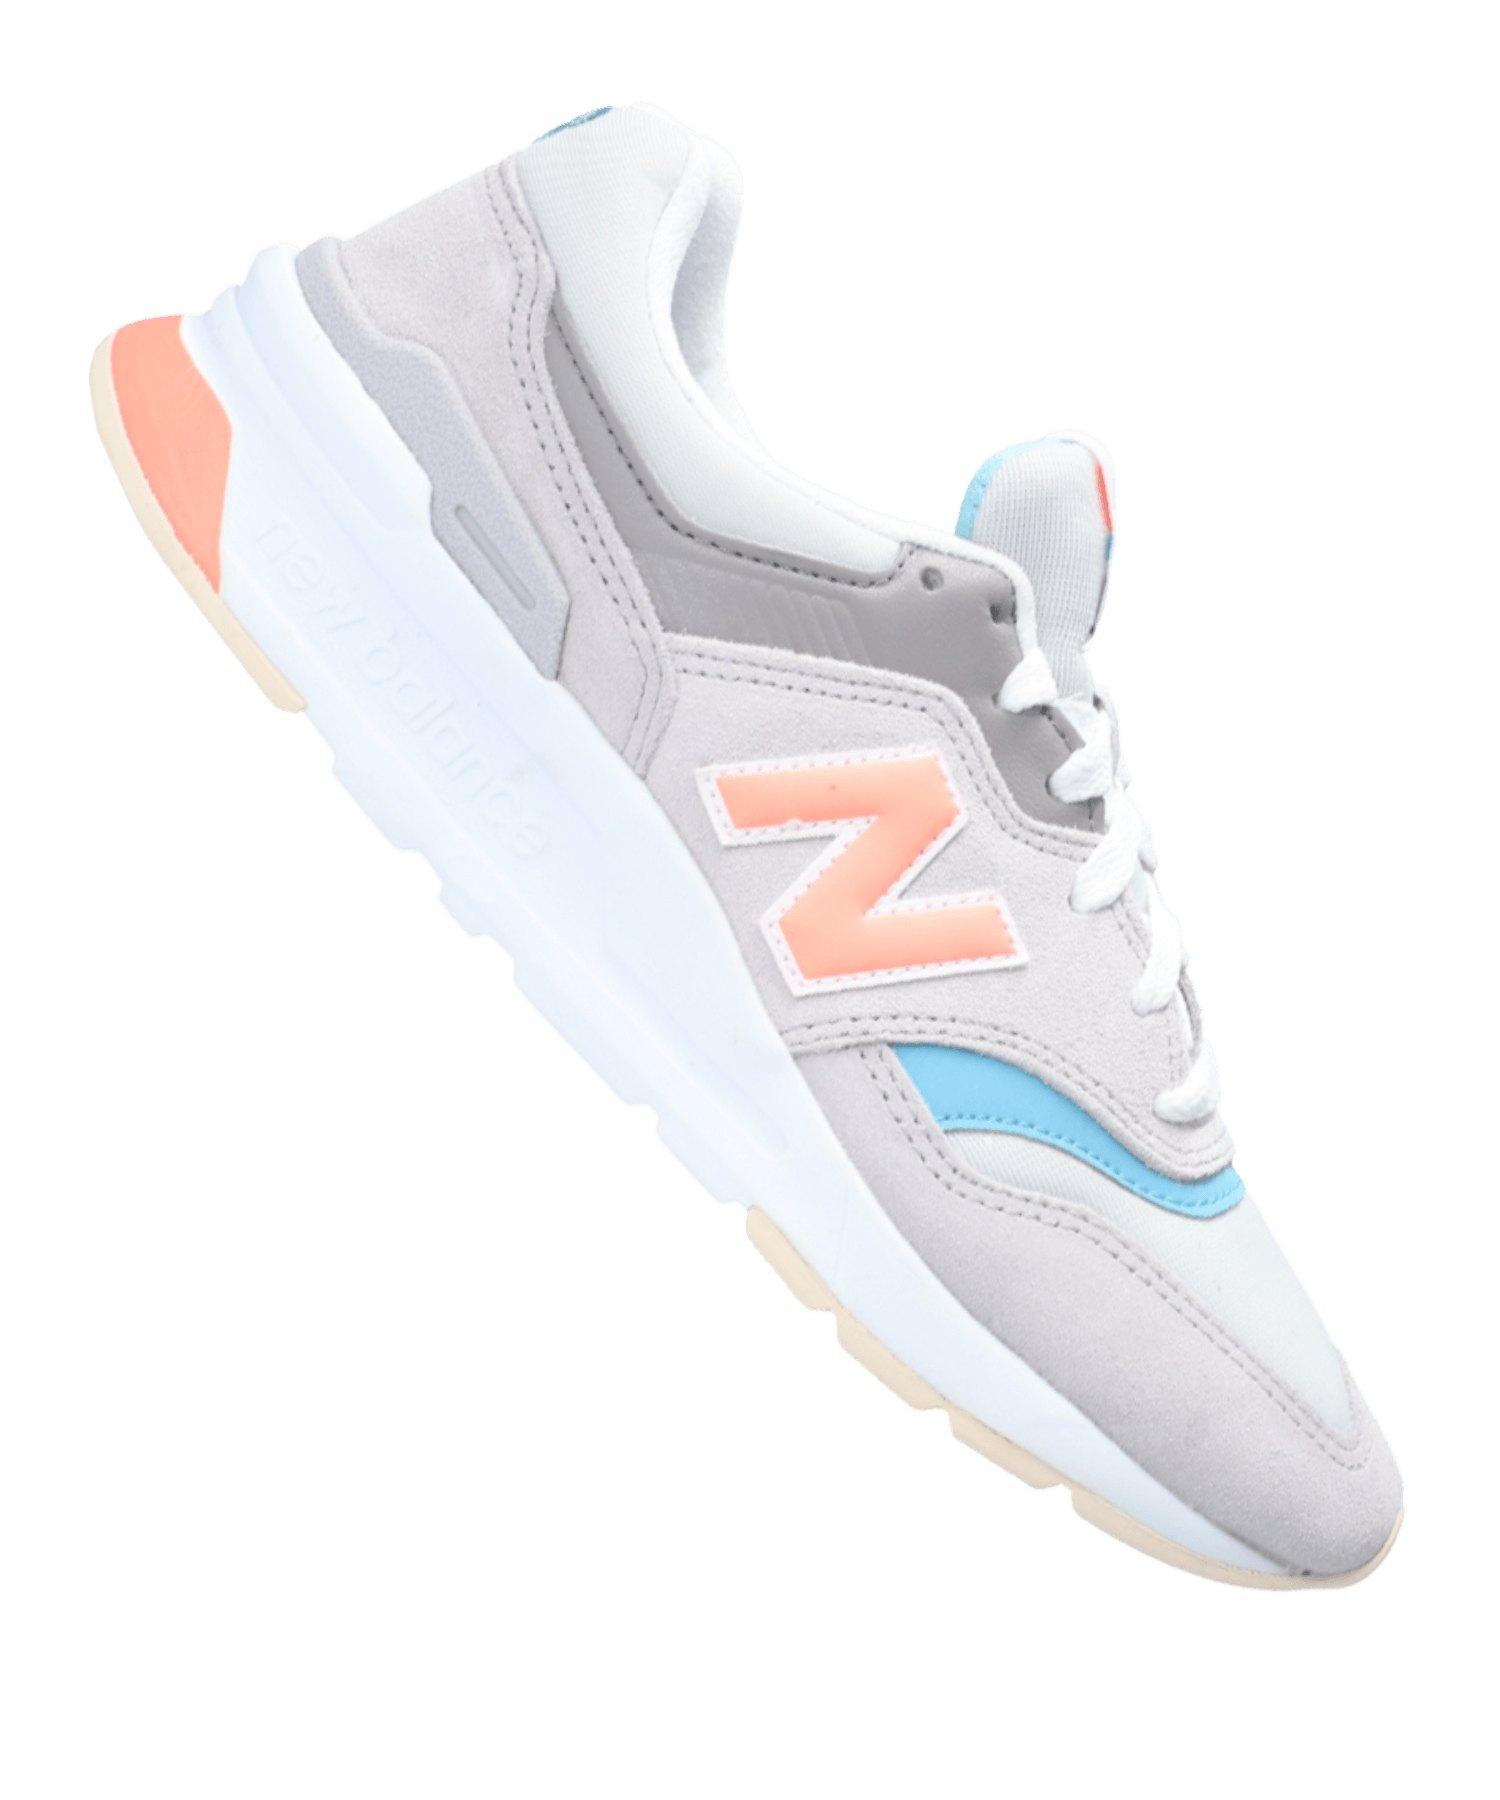 New Balance CW997 B Sneaker Damen Grau F121 - grau